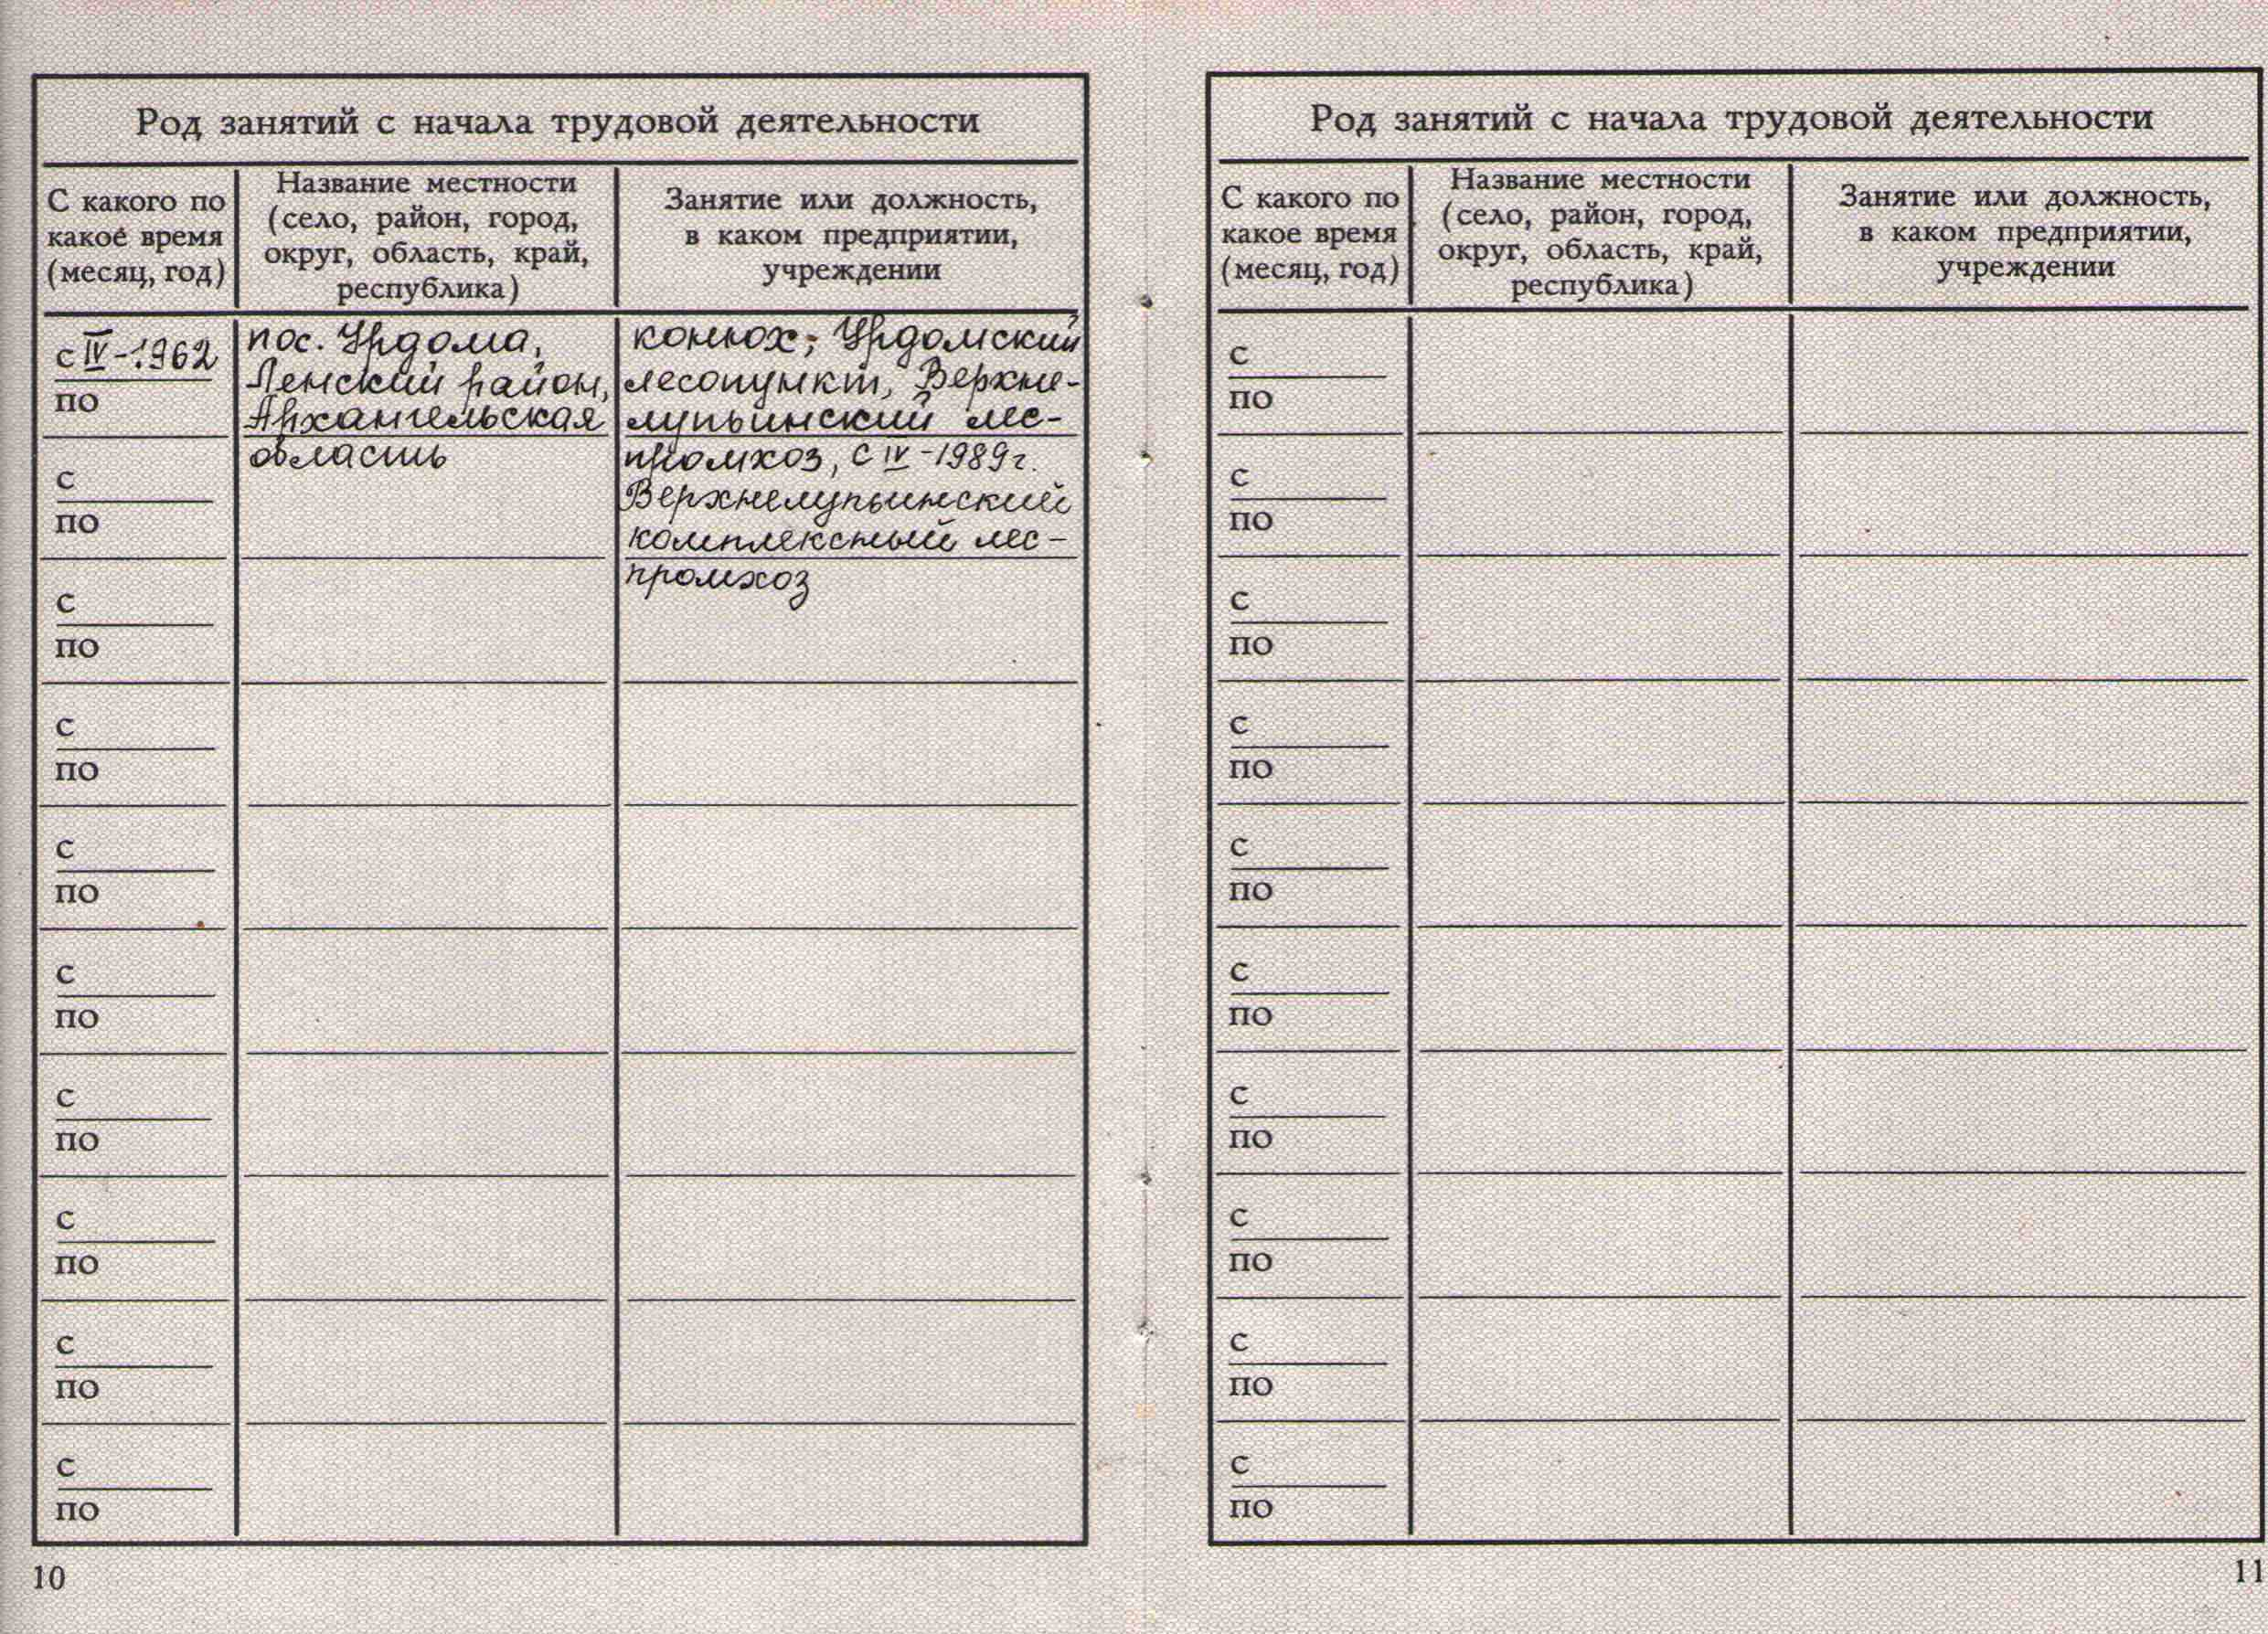 84. Учетная карточка члена партии Барыкина ПП, 1974.